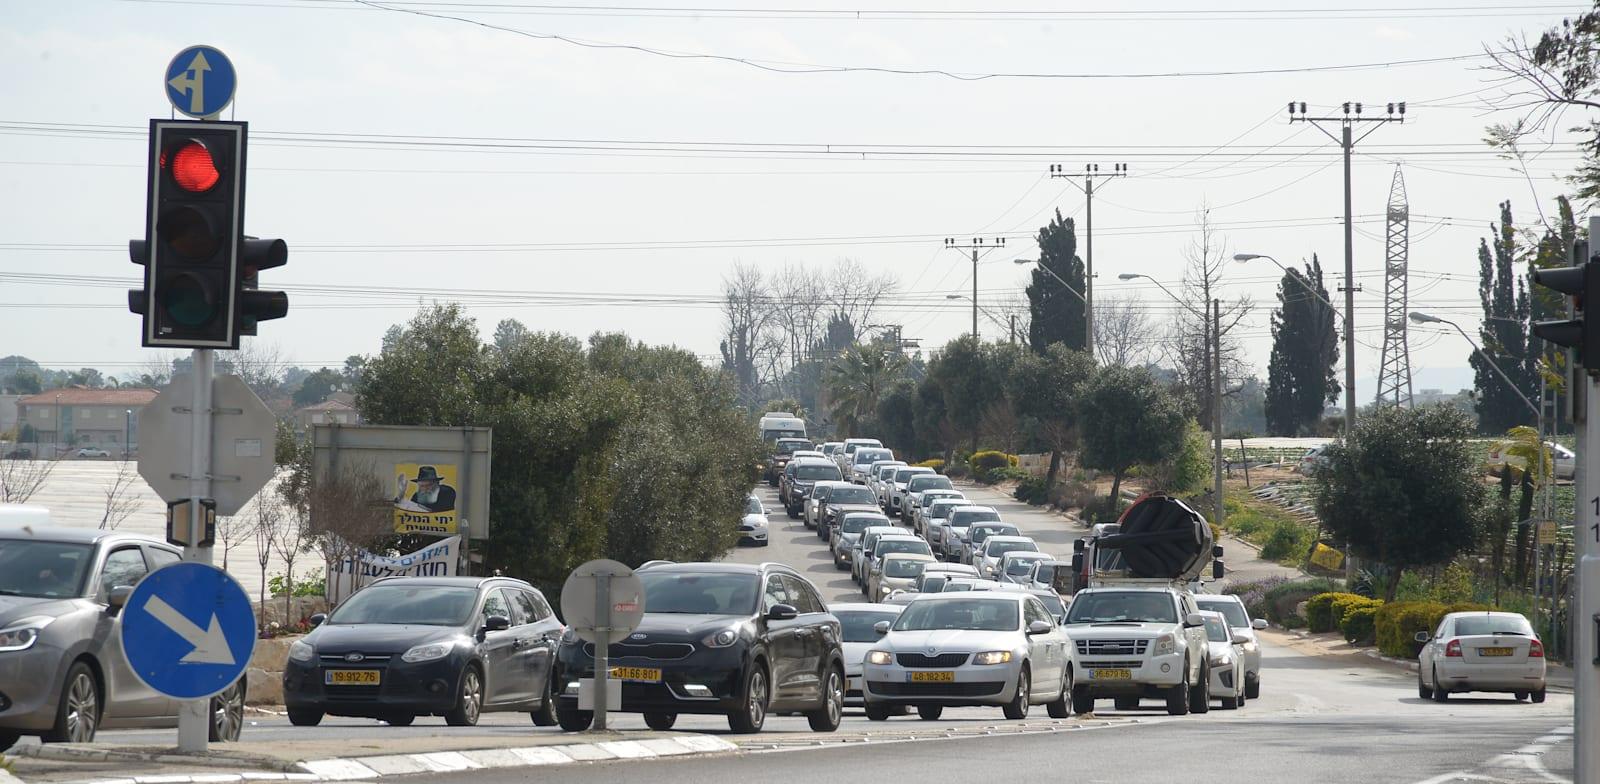 Traffic lights Photo: Eyal Izhar